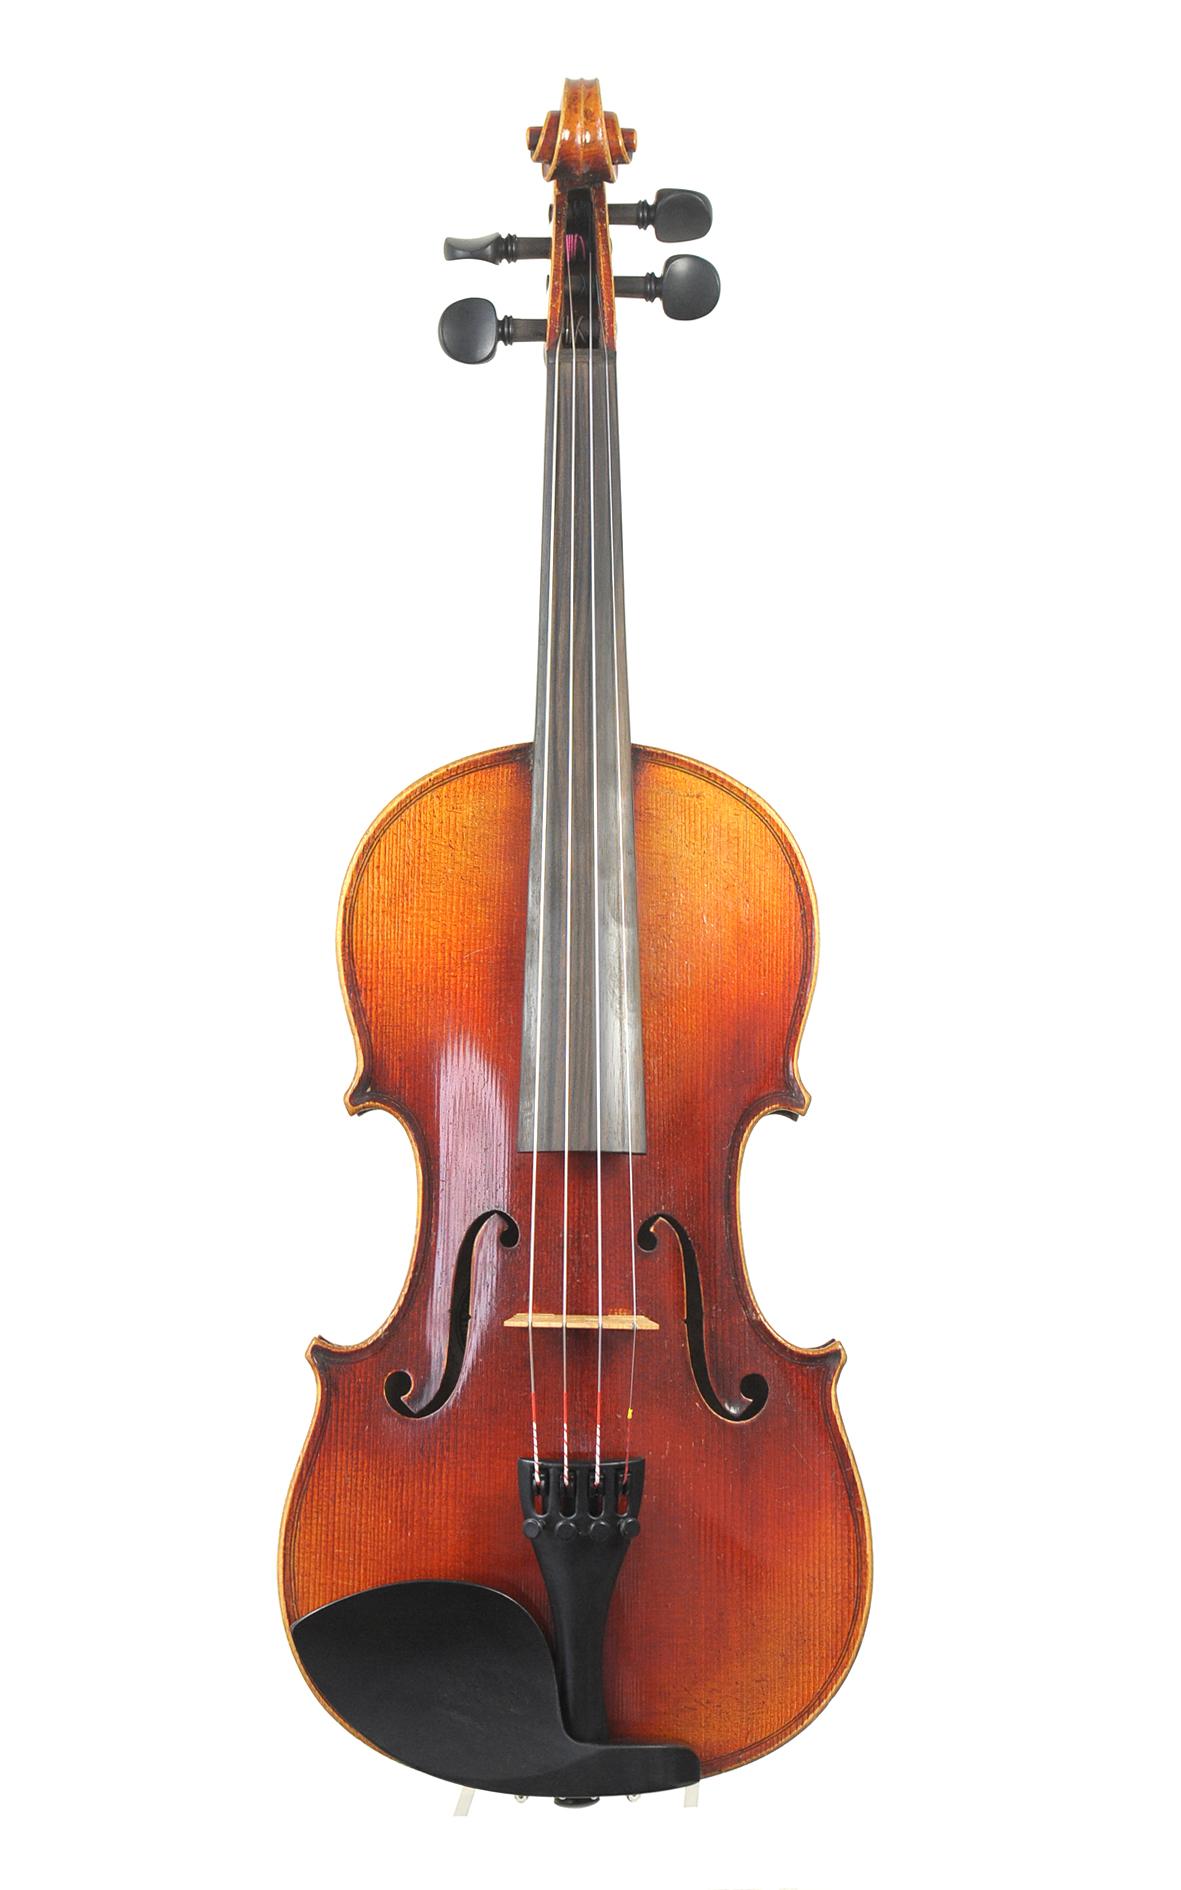 German Cello Edmund Paulus 1900 Musical Instruments & Gear Orchestral